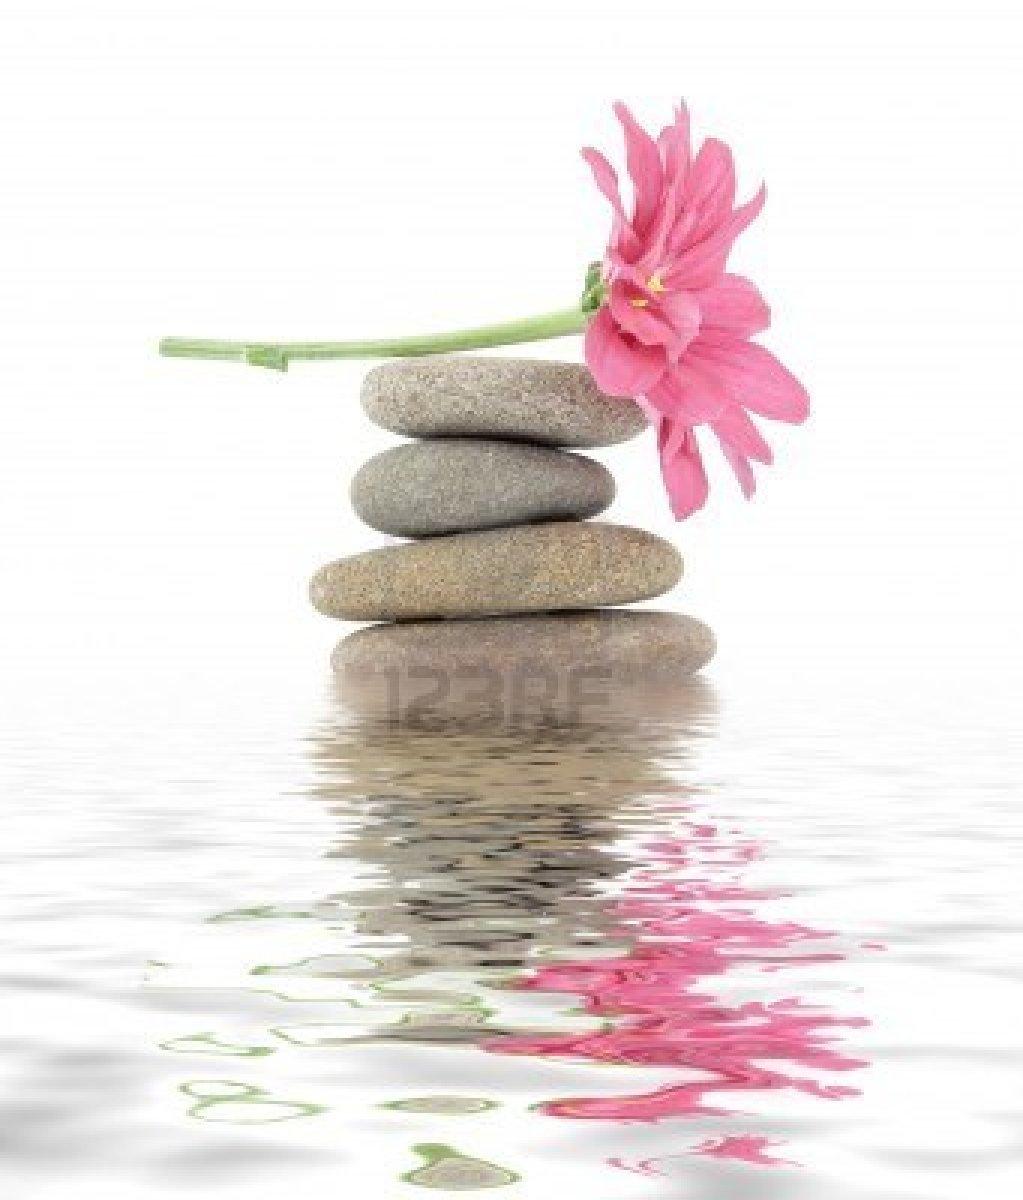 Http Islandgirl4ever2 Blogspot Com 2013 01 Going Zen In 2013 Soul Searching Html